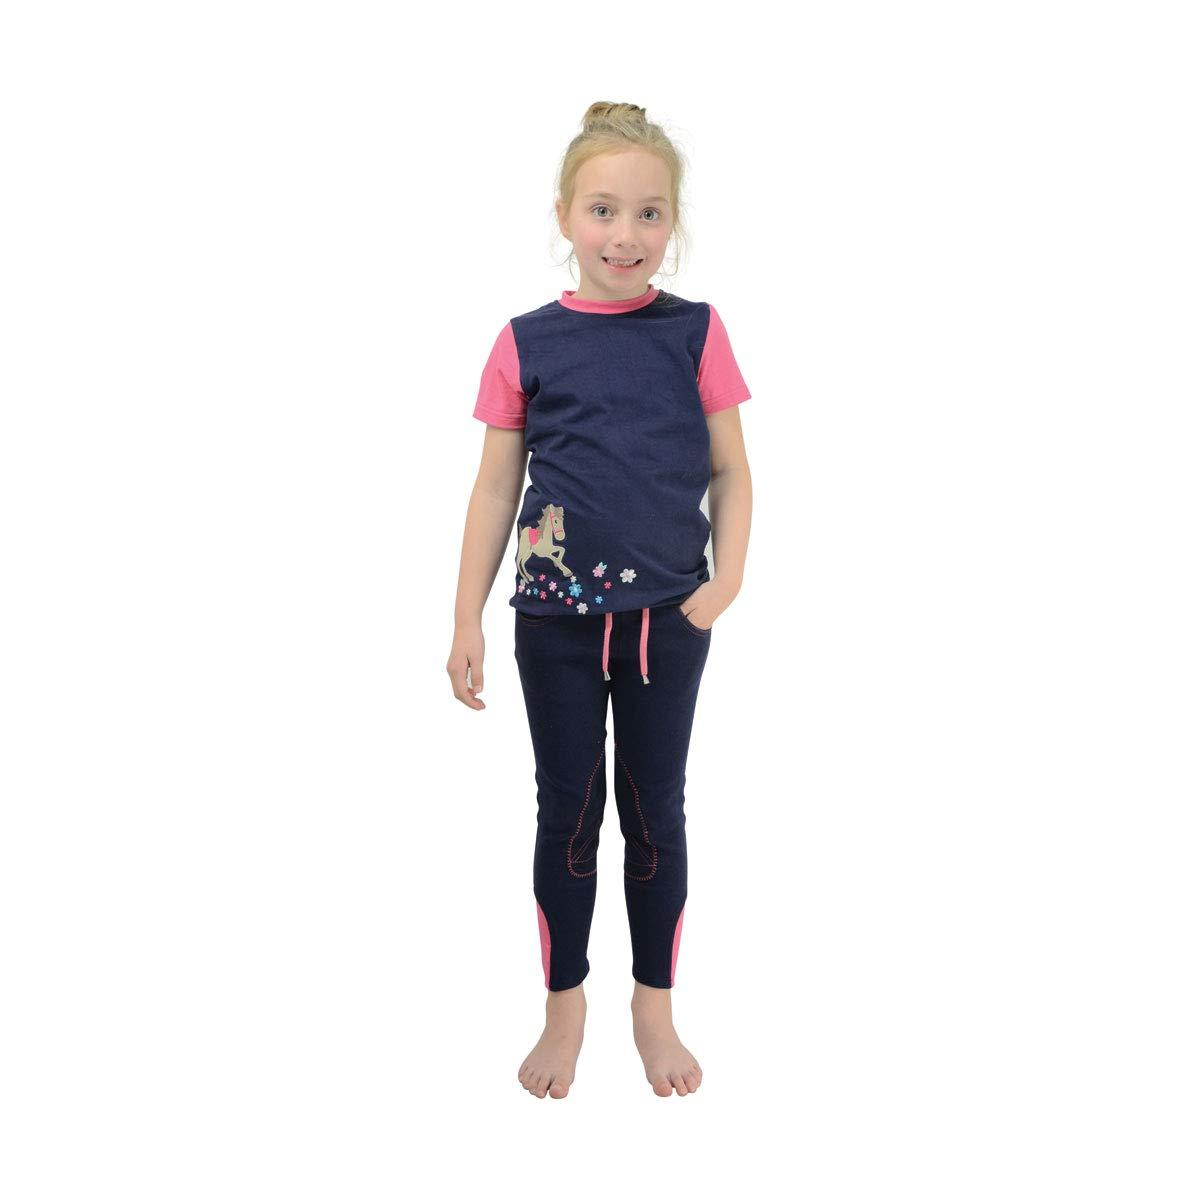 Stedman Childrens Kids Boys Girls Childs Plain Cotton Piqué Polo Shirt